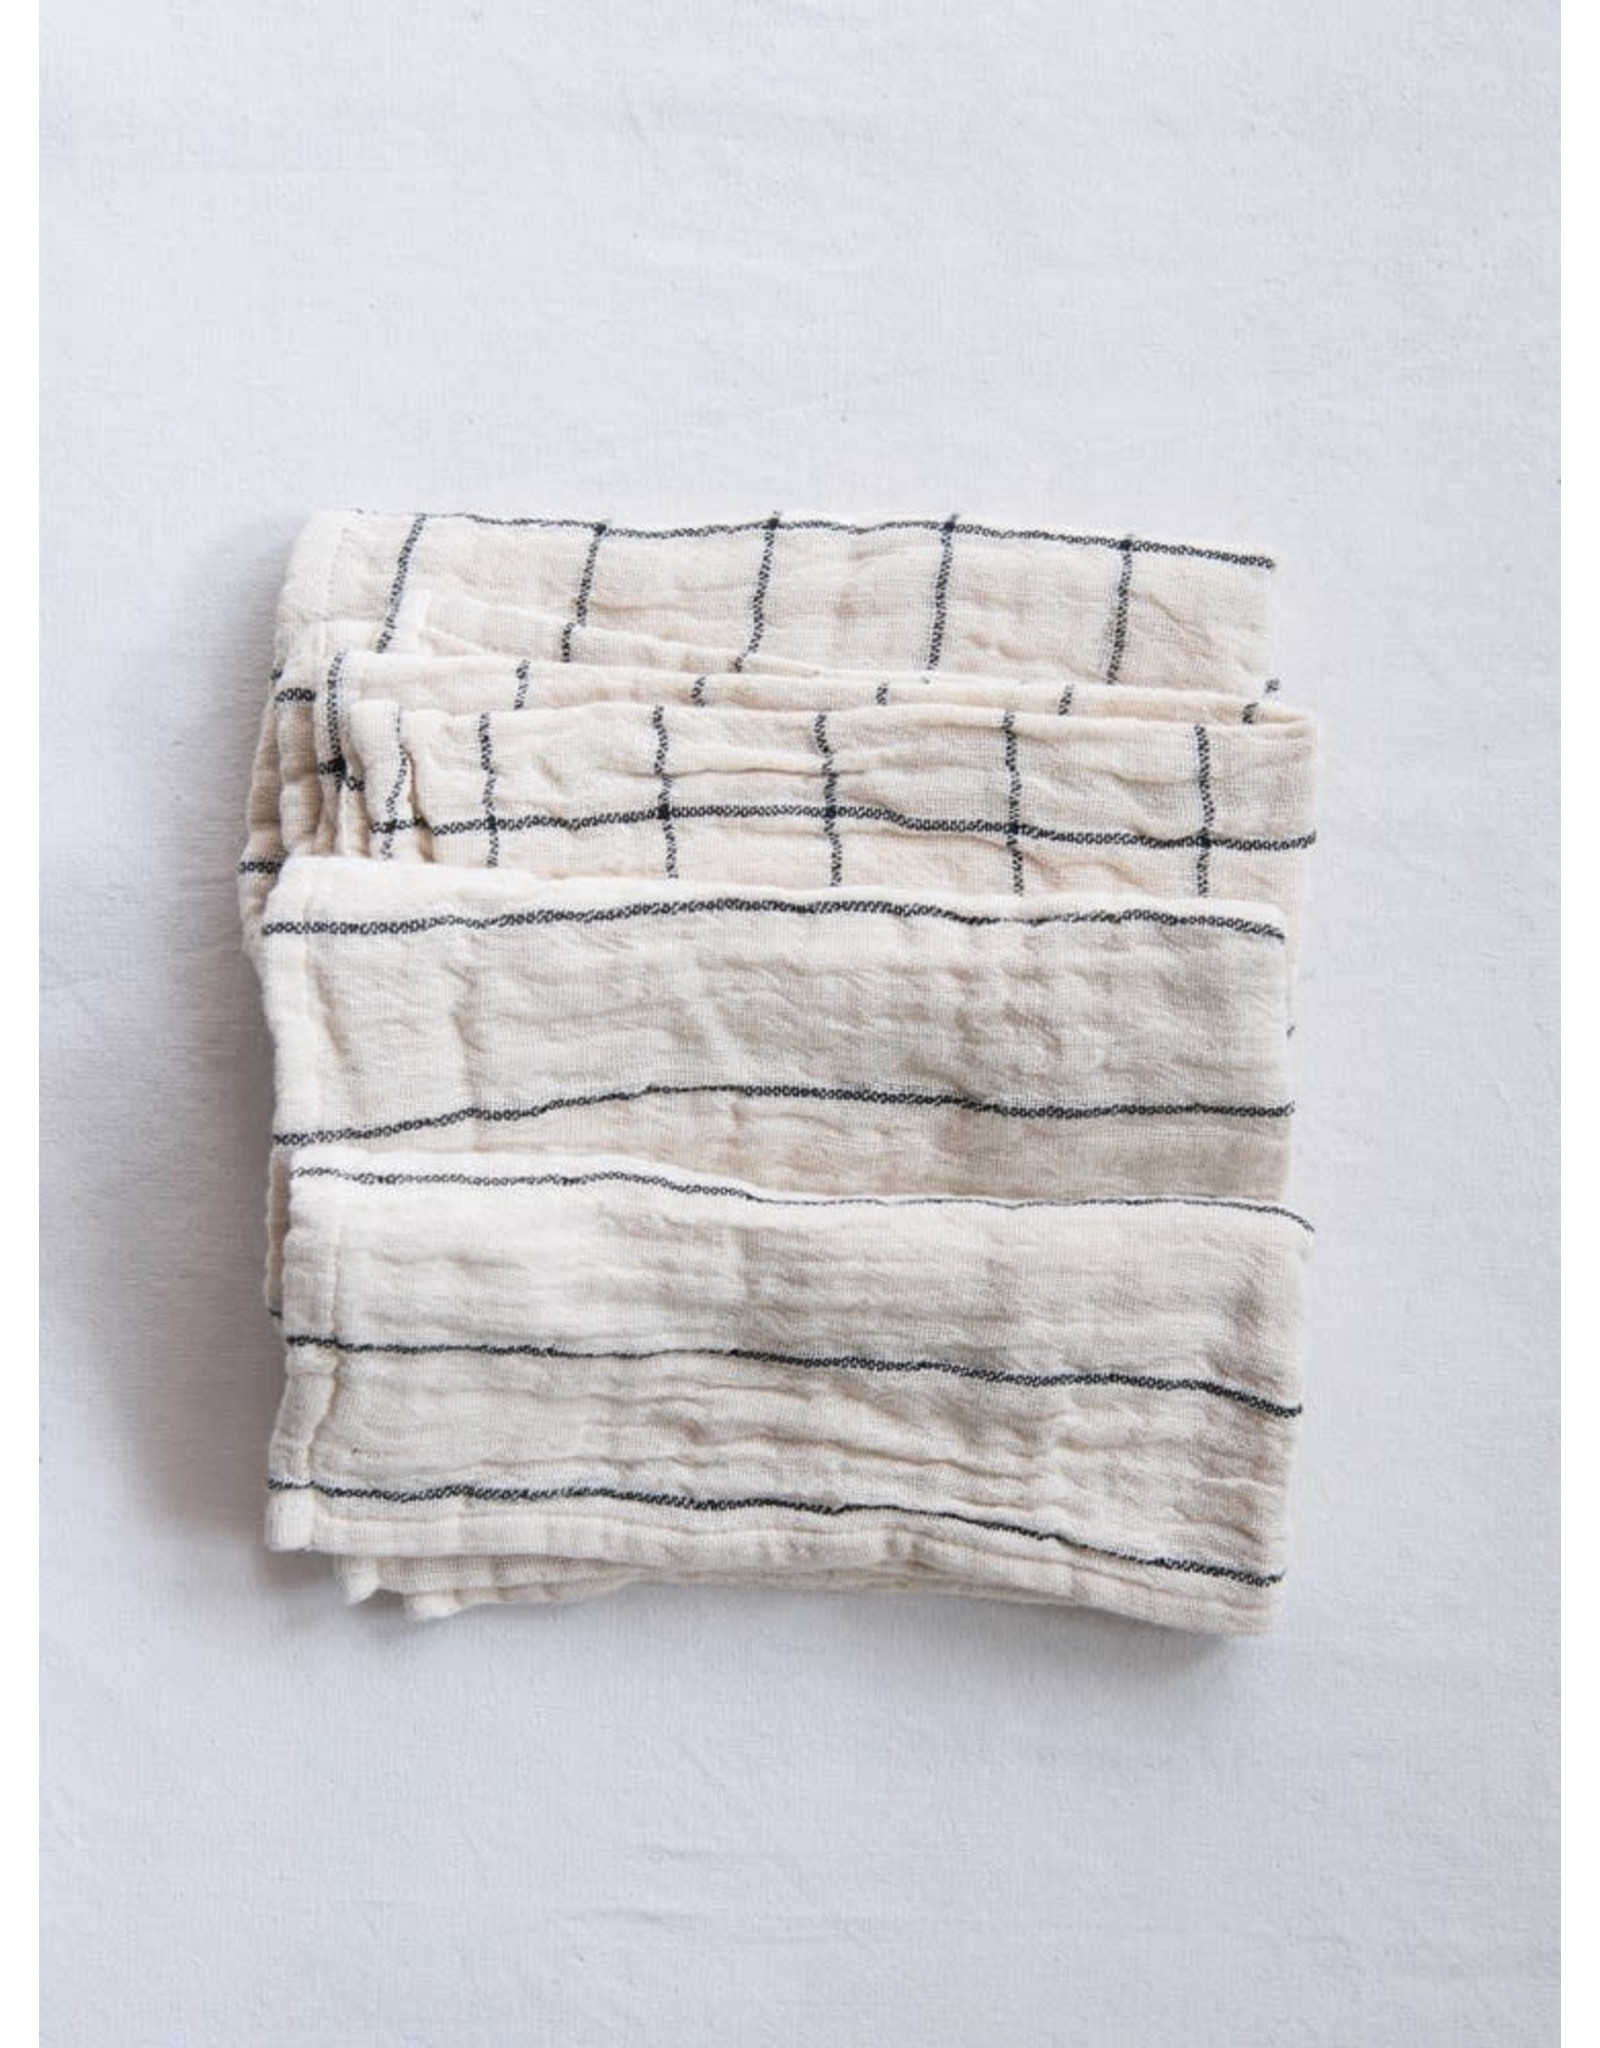 "Creative Co-op 18"" Woven Napkins Set w/ Plaid & Stripes - Natural"